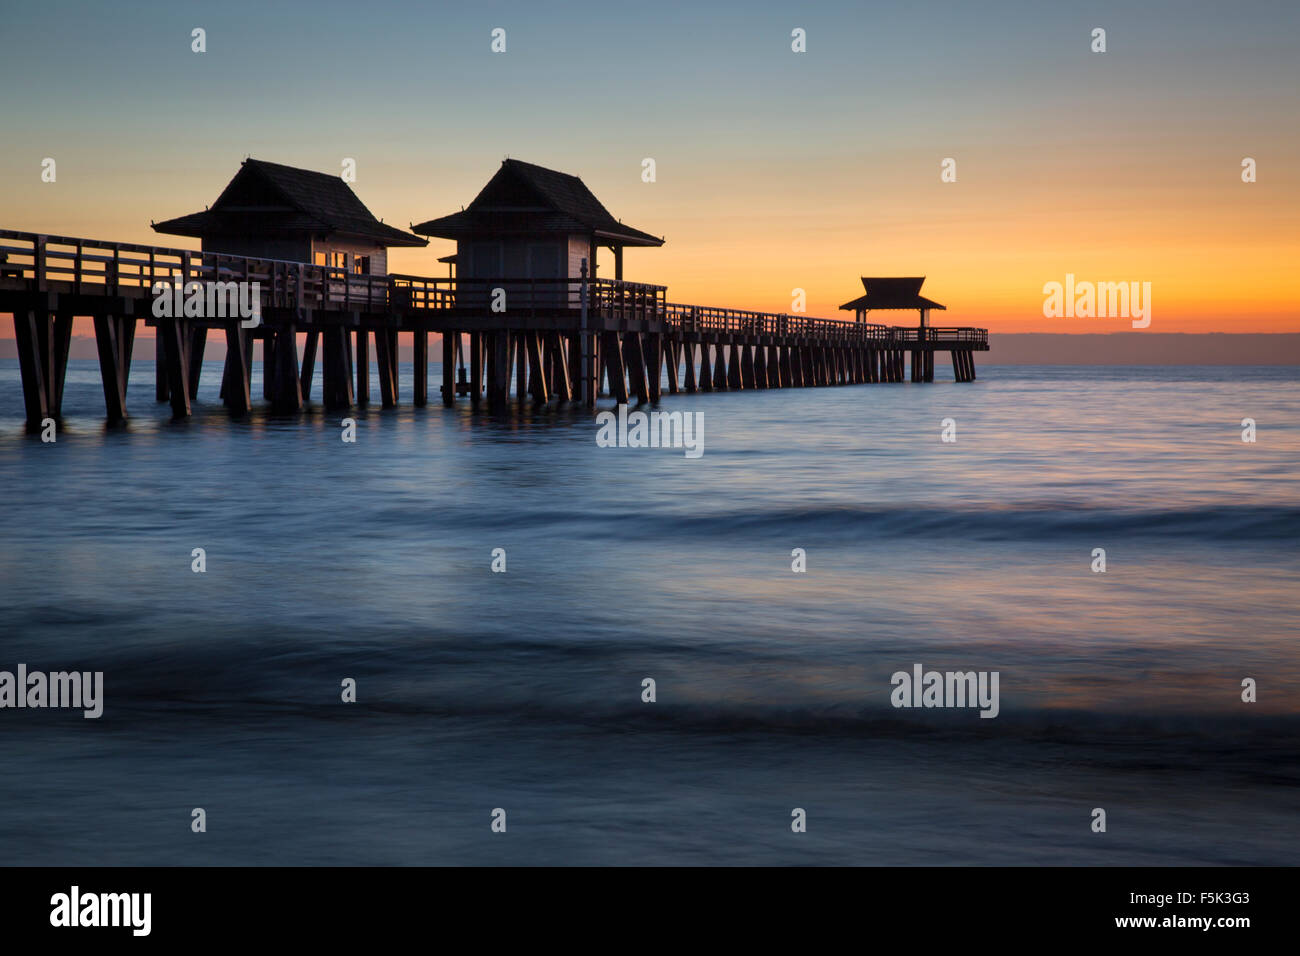 Twilight at the Naples Pier, Naples, Florida, USA - Stock Image